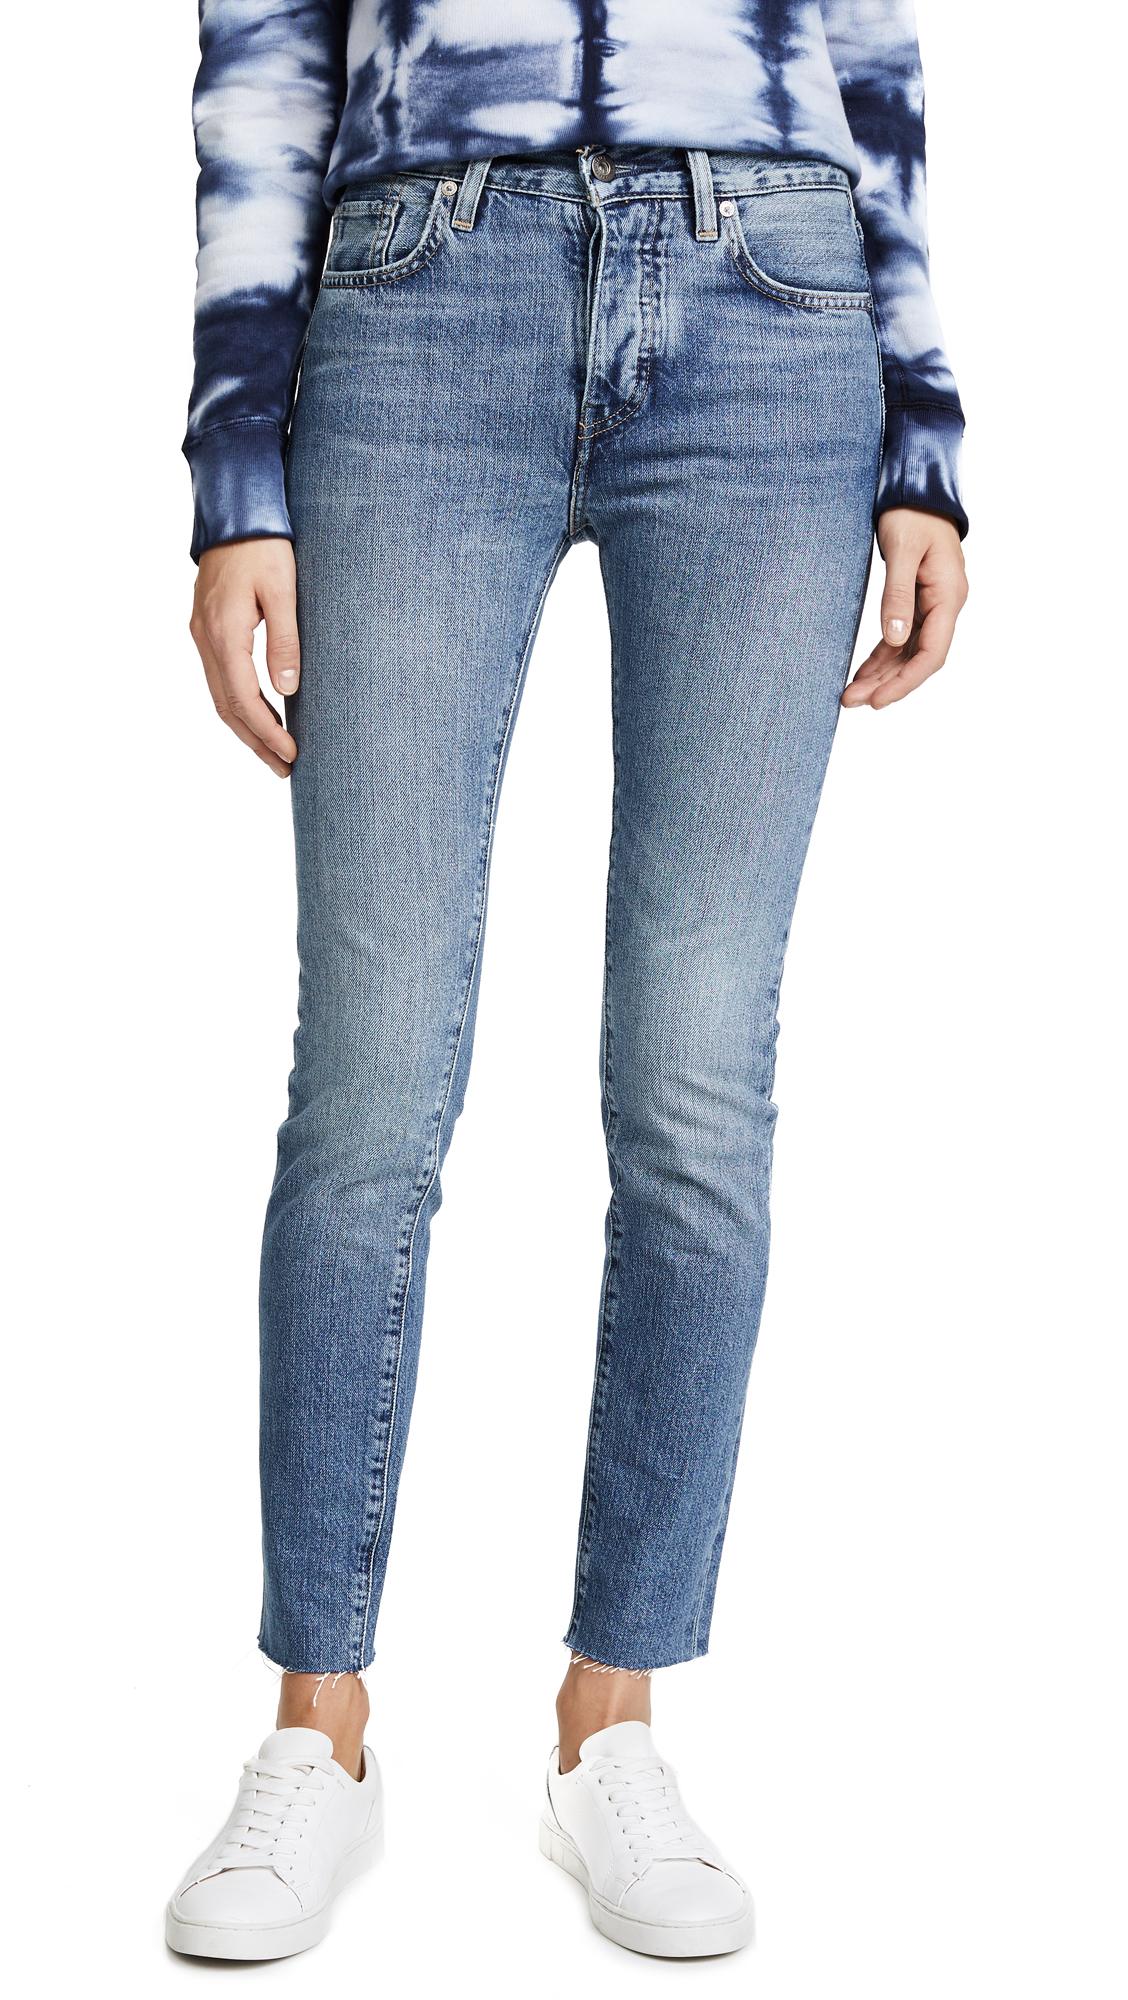 Levis LMC x SHOPBOP Slim Straight Jeans - J-Bay